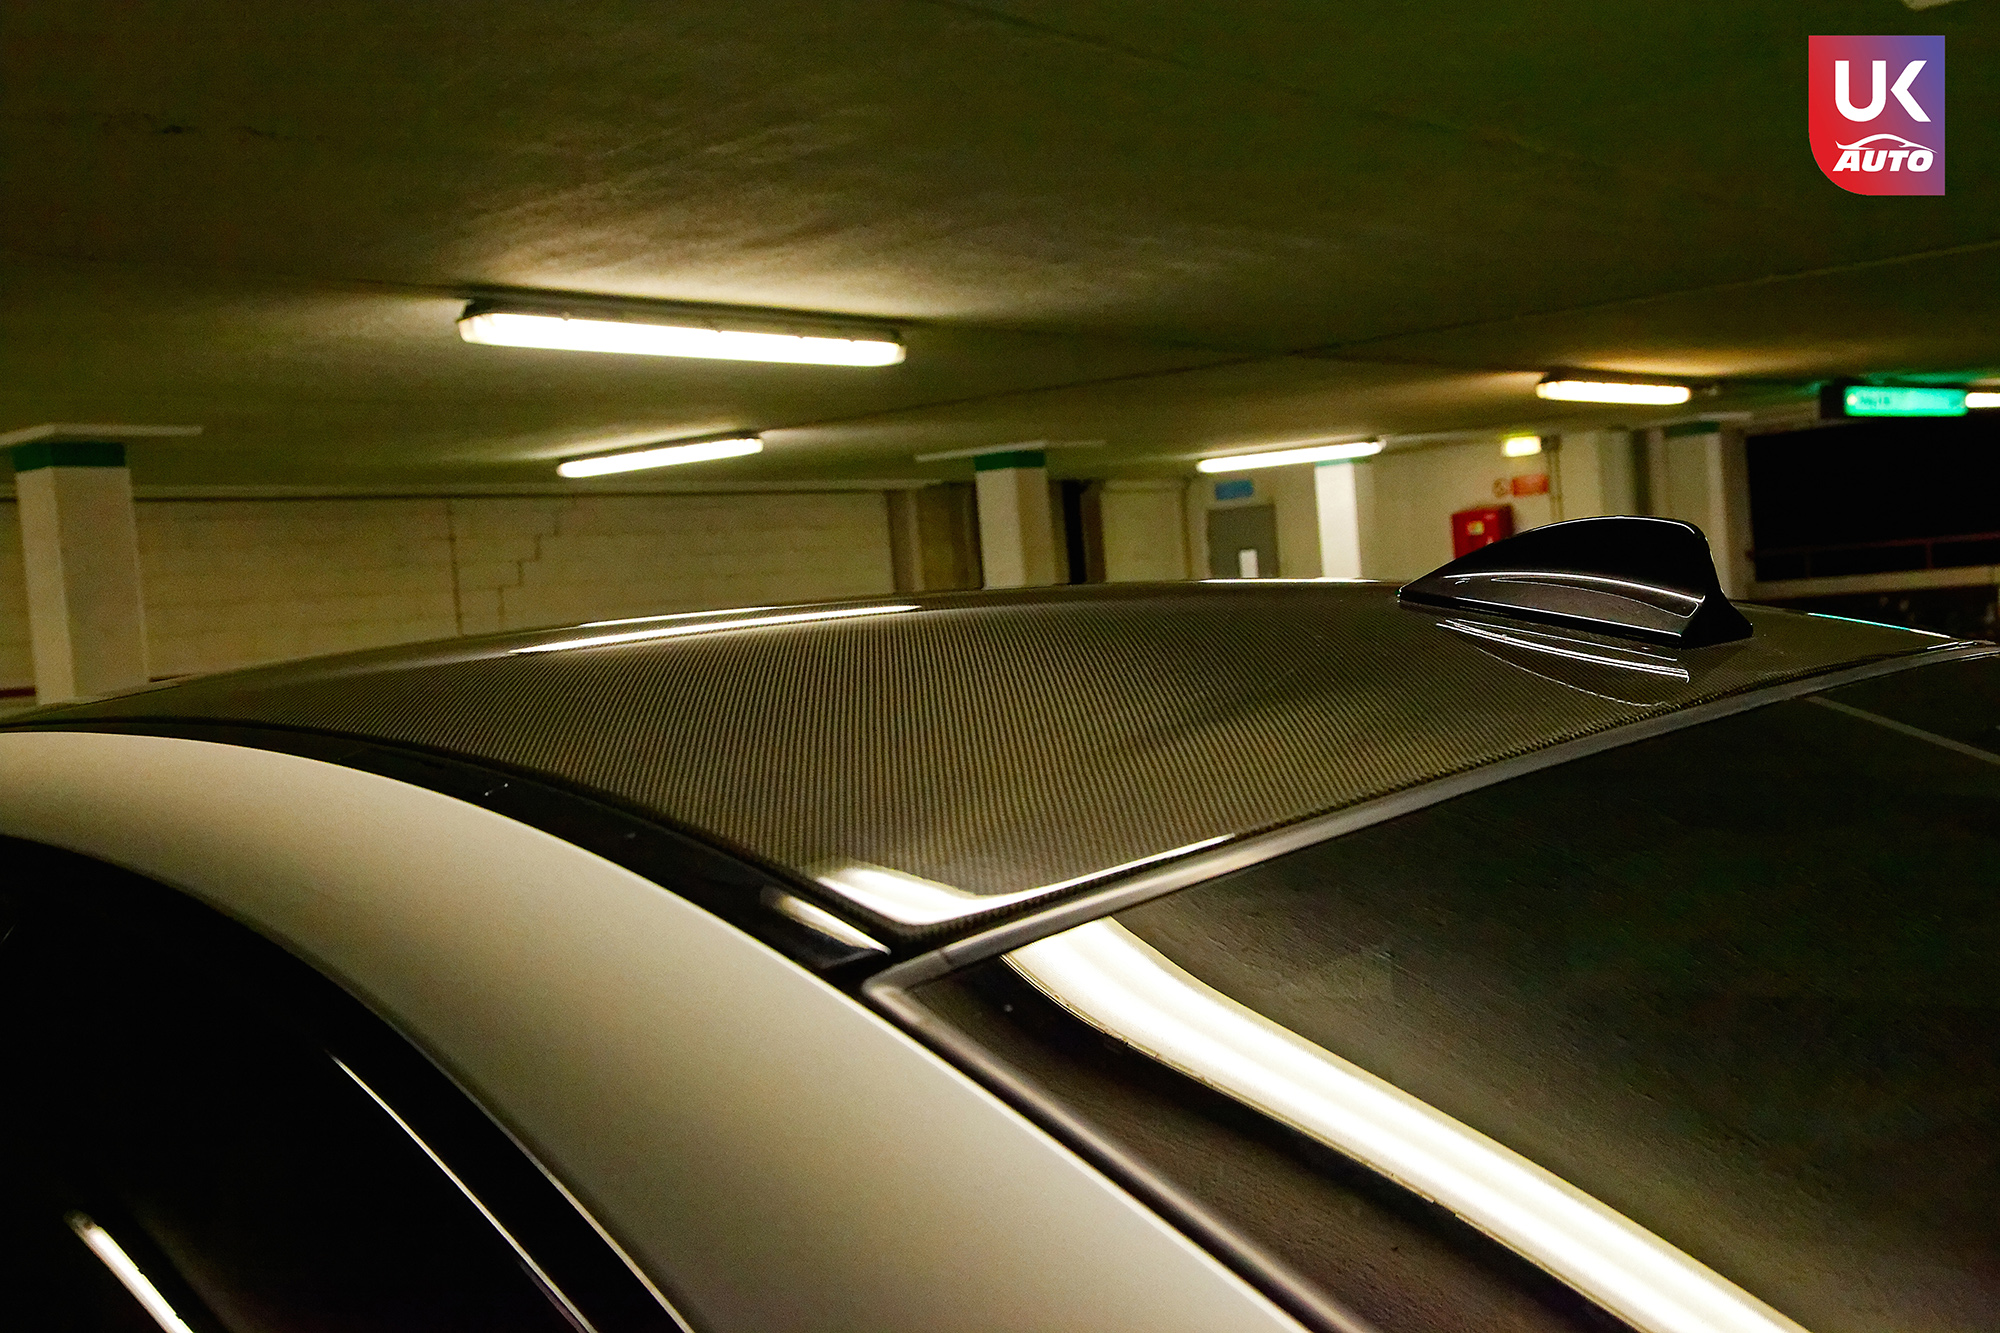 BMW m3 E92 import auto mandataire angleterre uk londres bmw leboncoin achat angleterre bmw voiture anglaise auto rhd e92 uk auto11 - Felecitation a Clement pour cette BMW M3 E92 COUPE RHD PACK CARBON BMW ANGLETERRE VOITURE UK